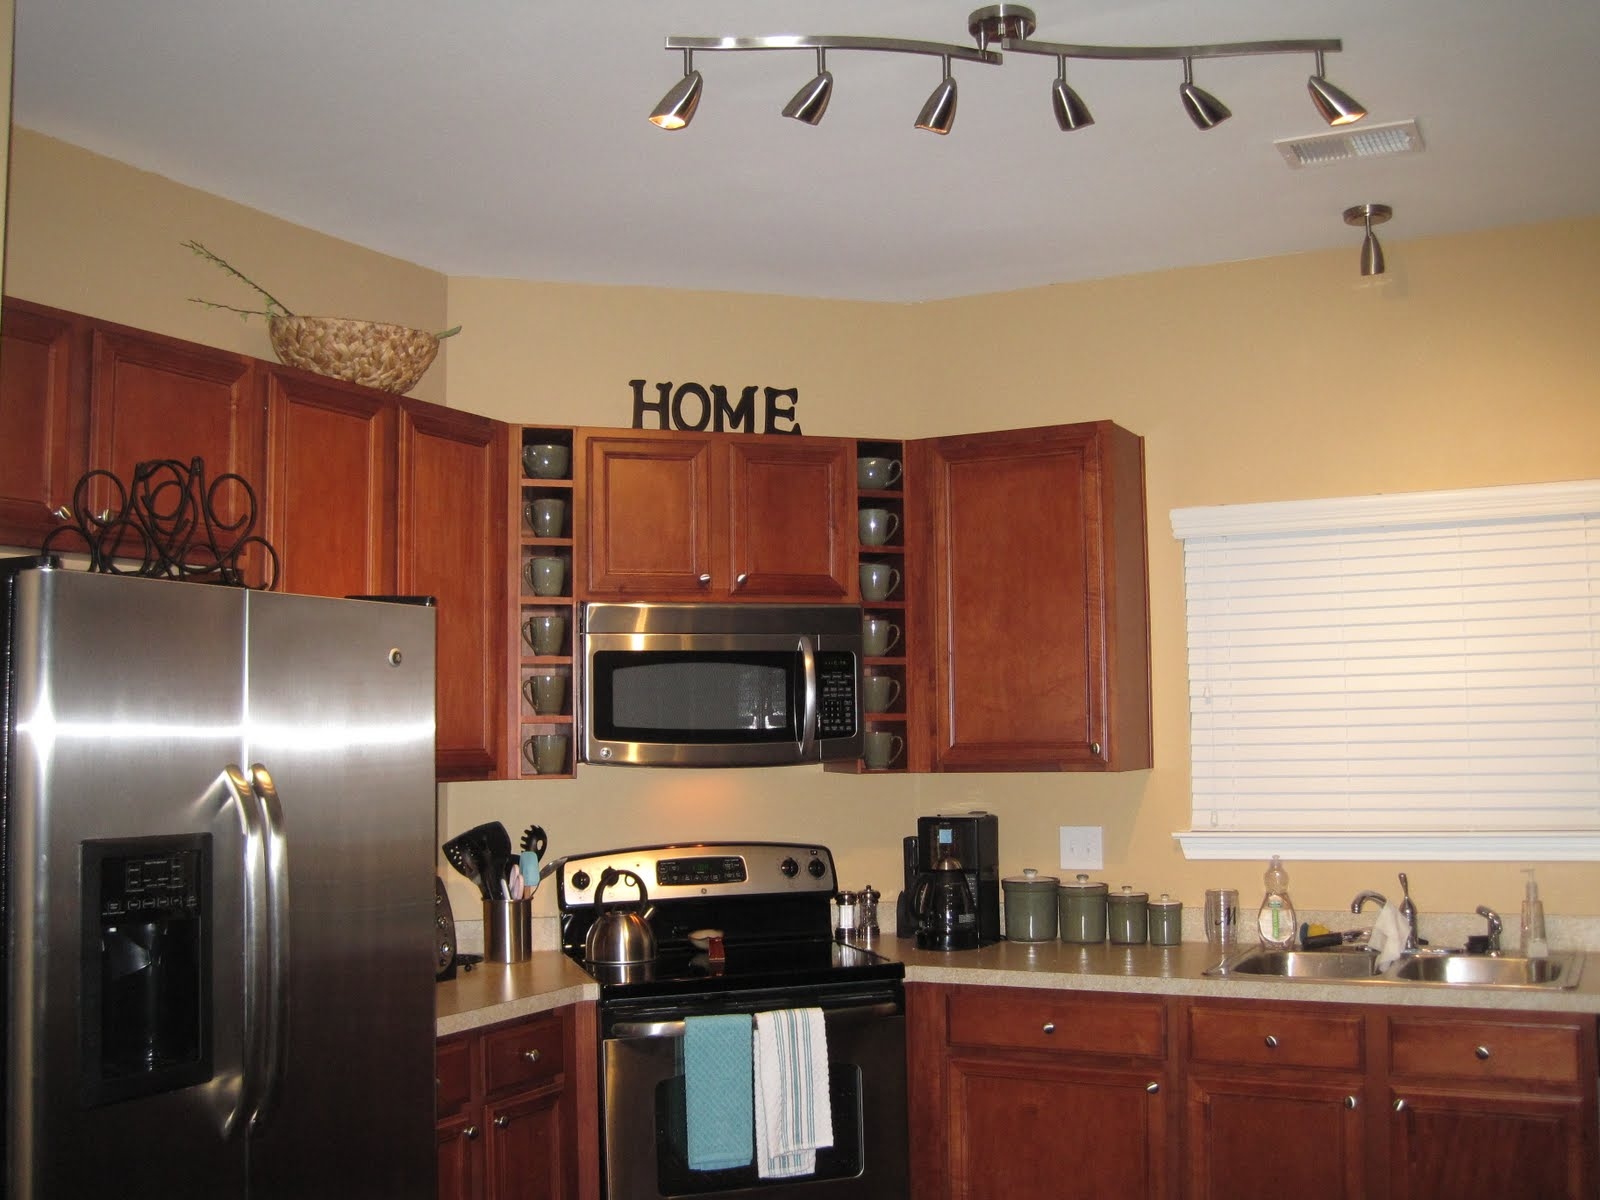 Brushed Nickel Kitchen Hardware Staten Island Cabinets Cabinet